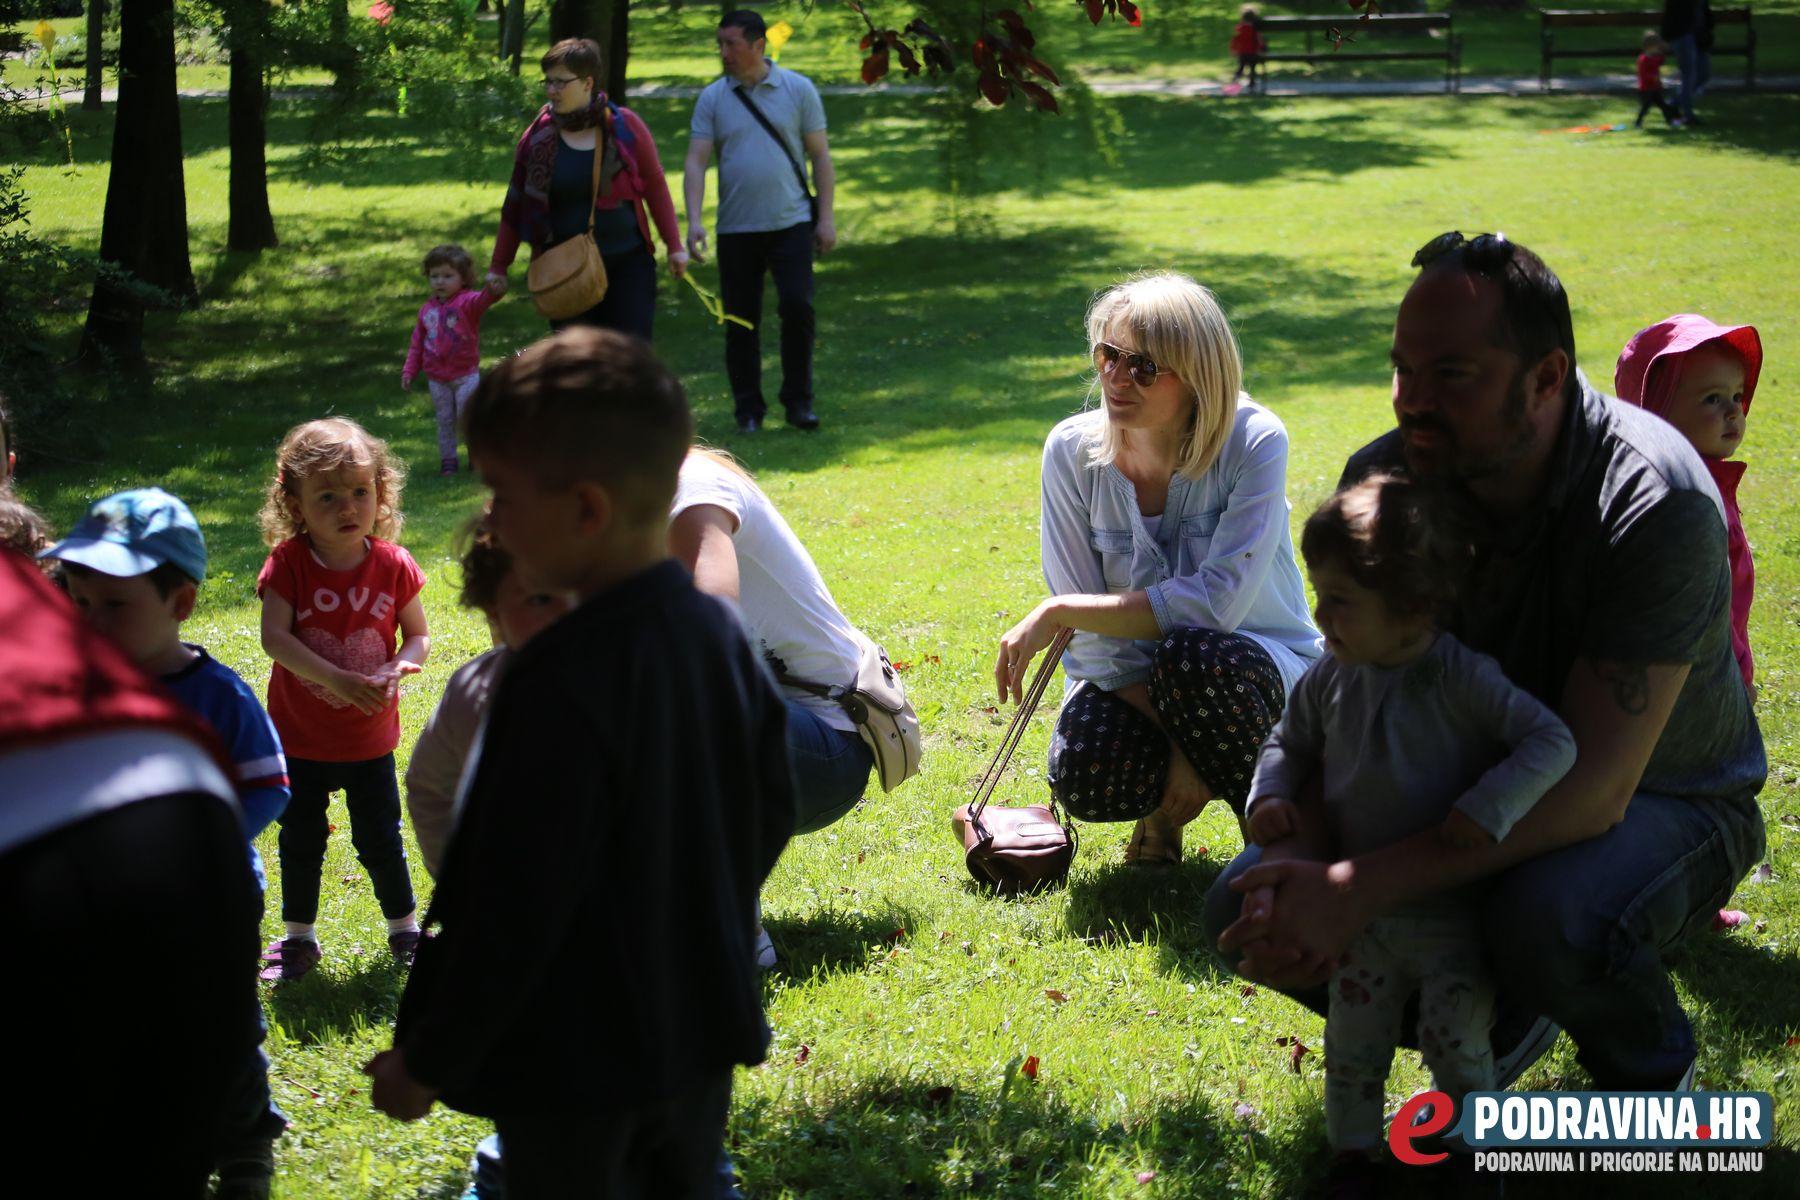 FOTO Brojni mališani uživali u radionici Leti leti zmaj - ePodravina ...